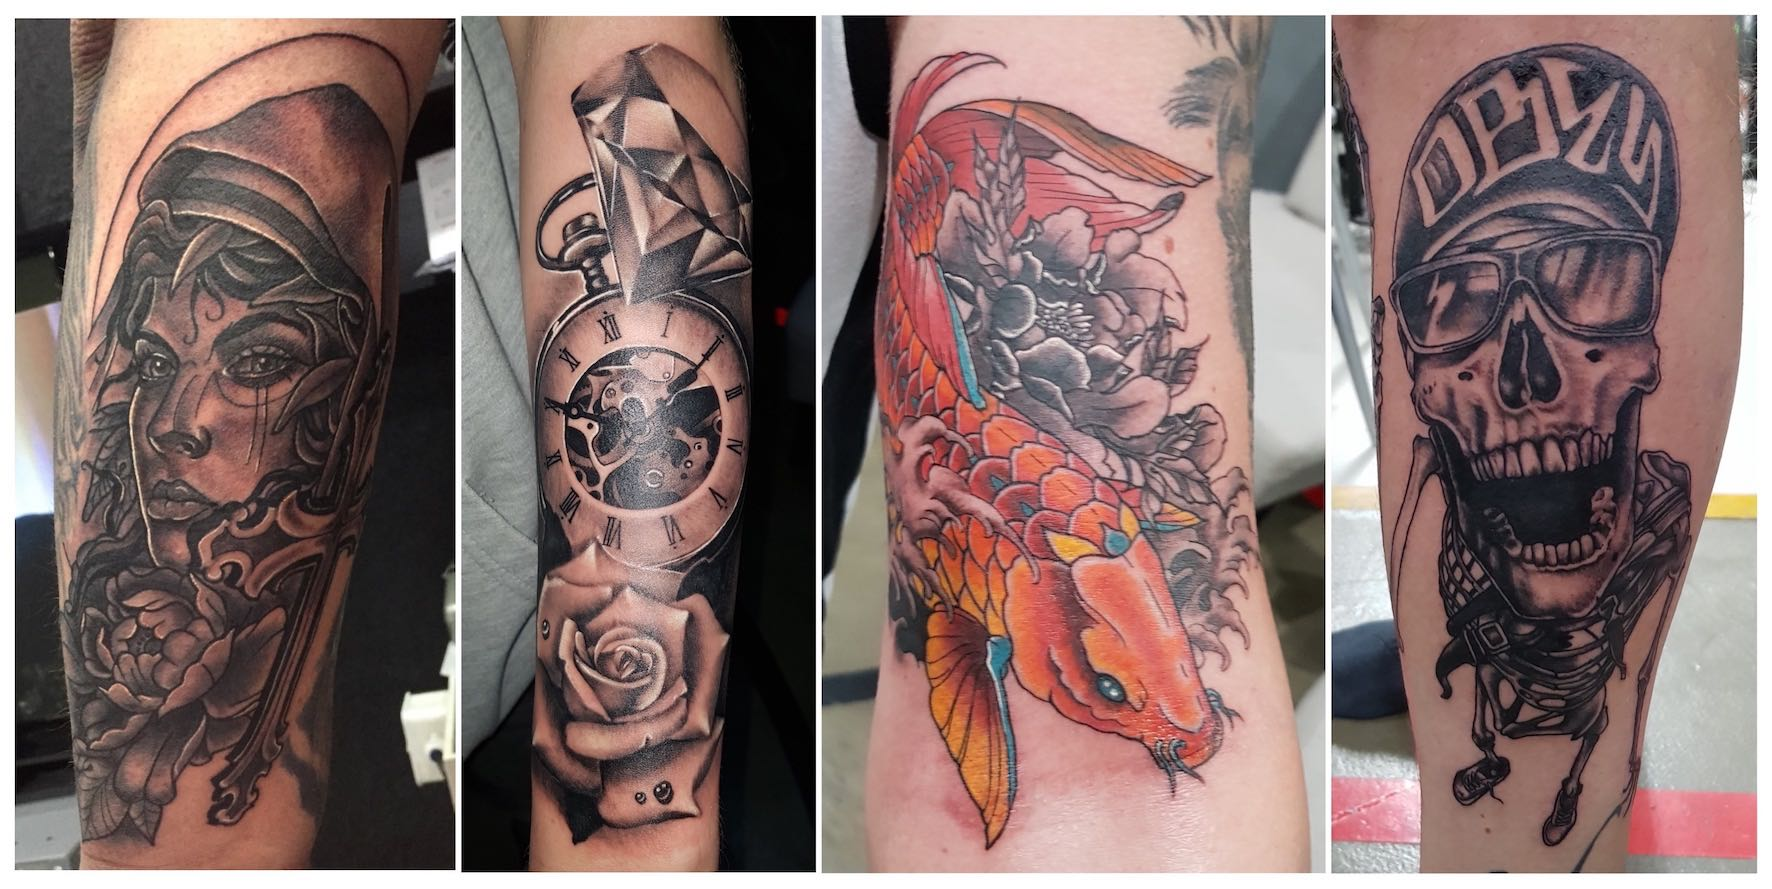 Tattoo work done by Brad Pretorius